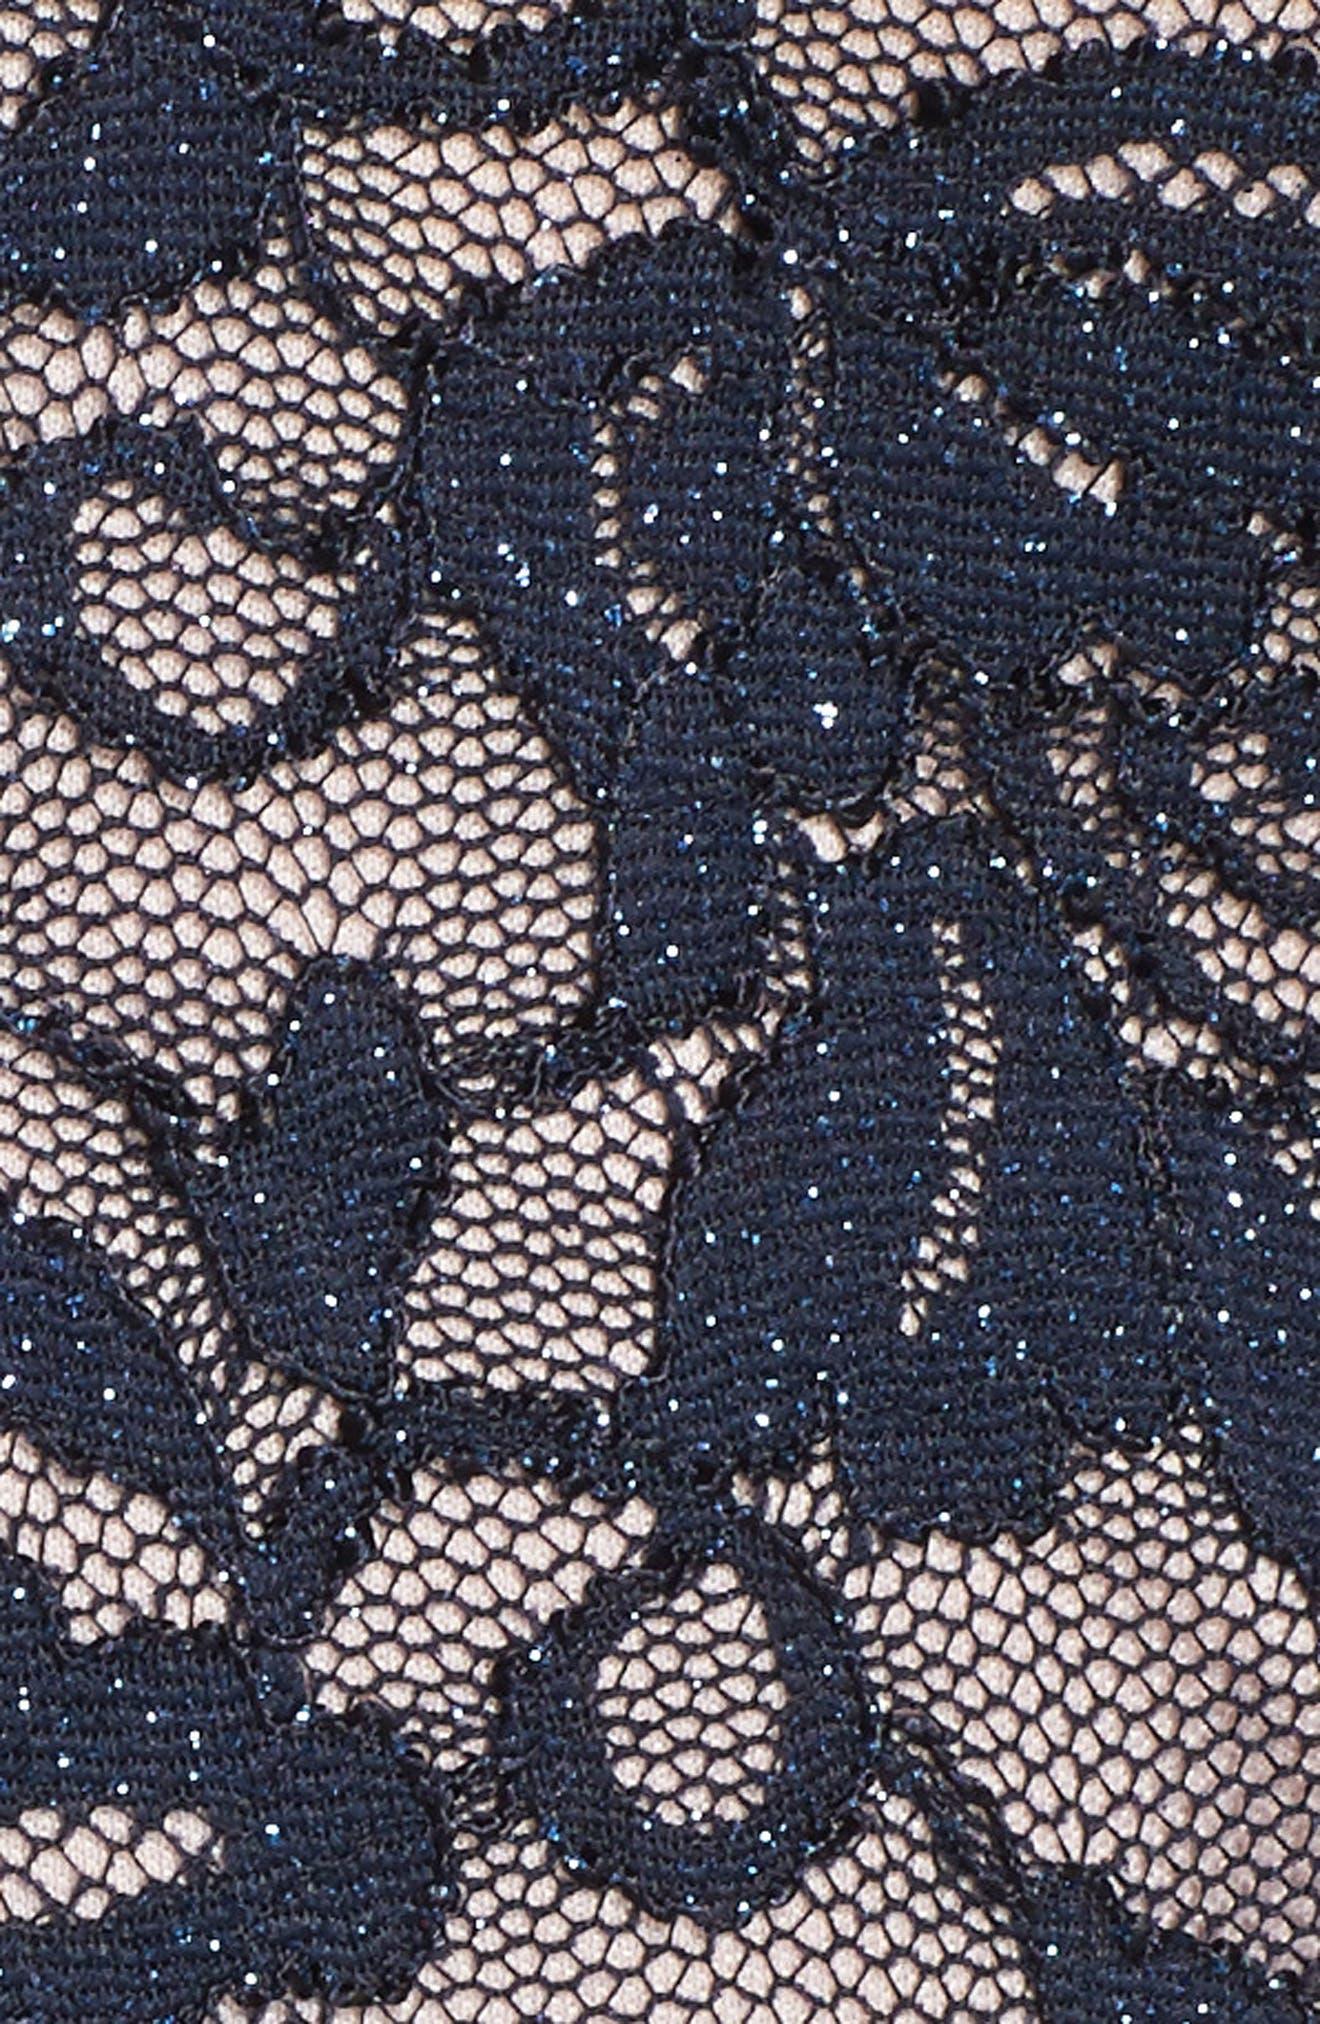 Glitter Lace Fit & Flare Dress,                             Alternate thumbnail 5, color,                             Navy/ Mauve